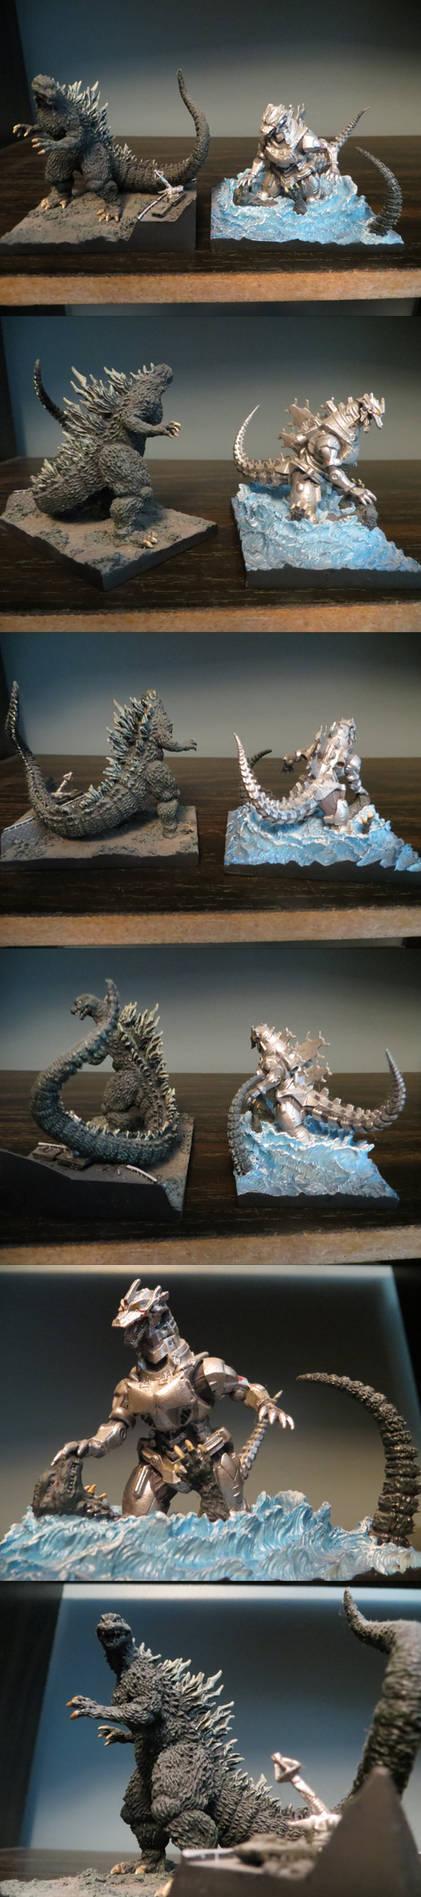 Polystone Kiryu vs Godzilla Toy Stock